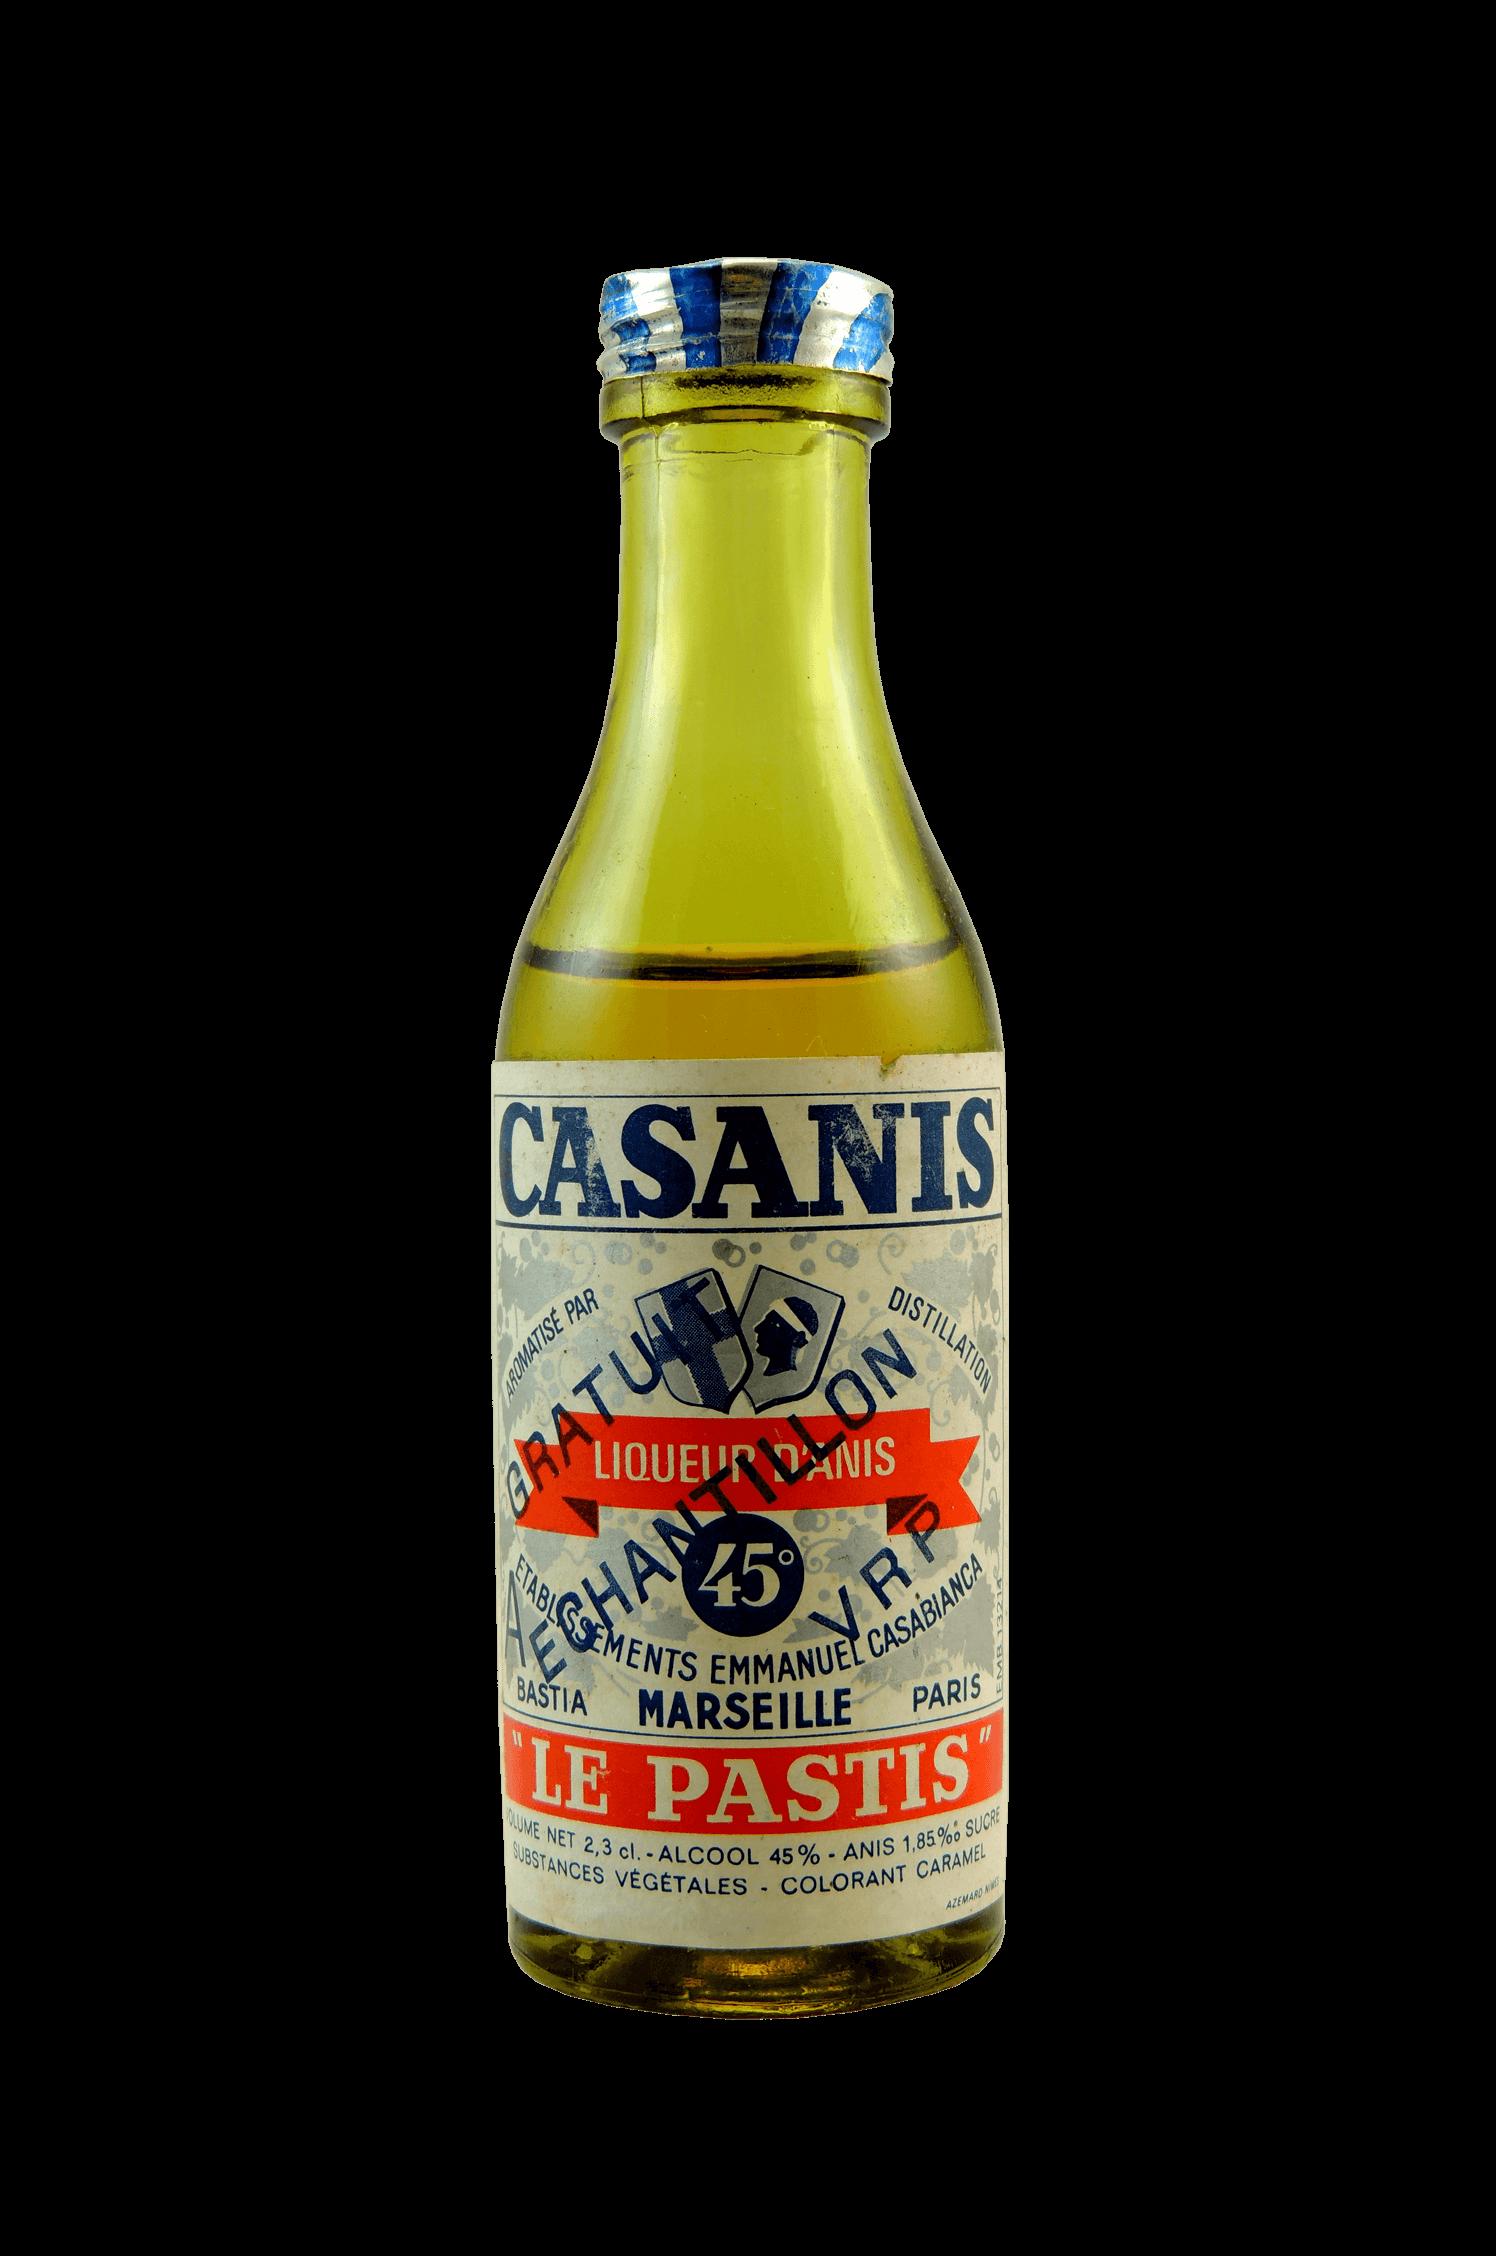 Casanis Liqueur